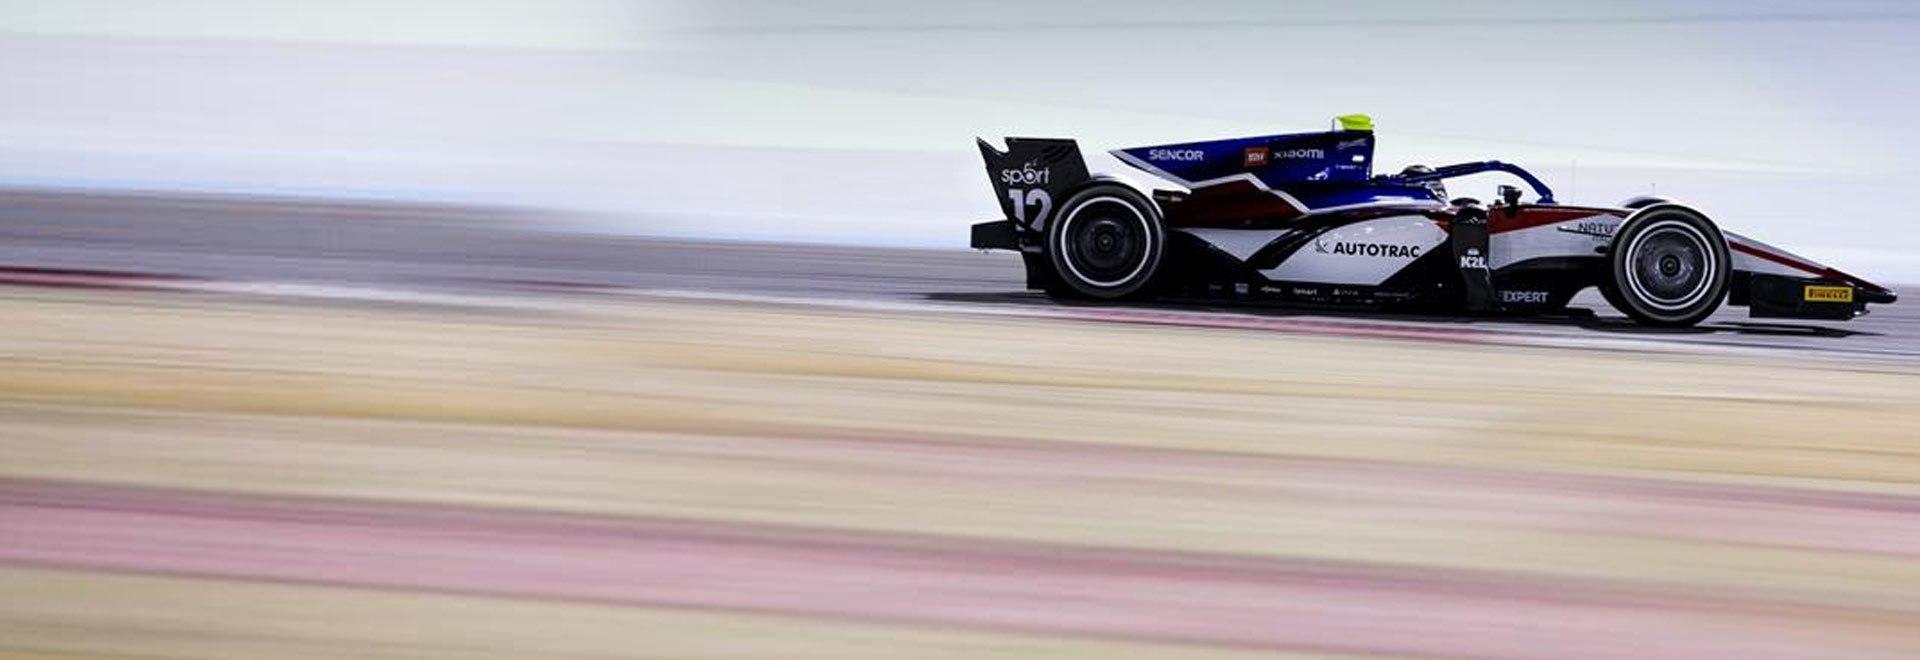 GP Sakhir. Sprint Race